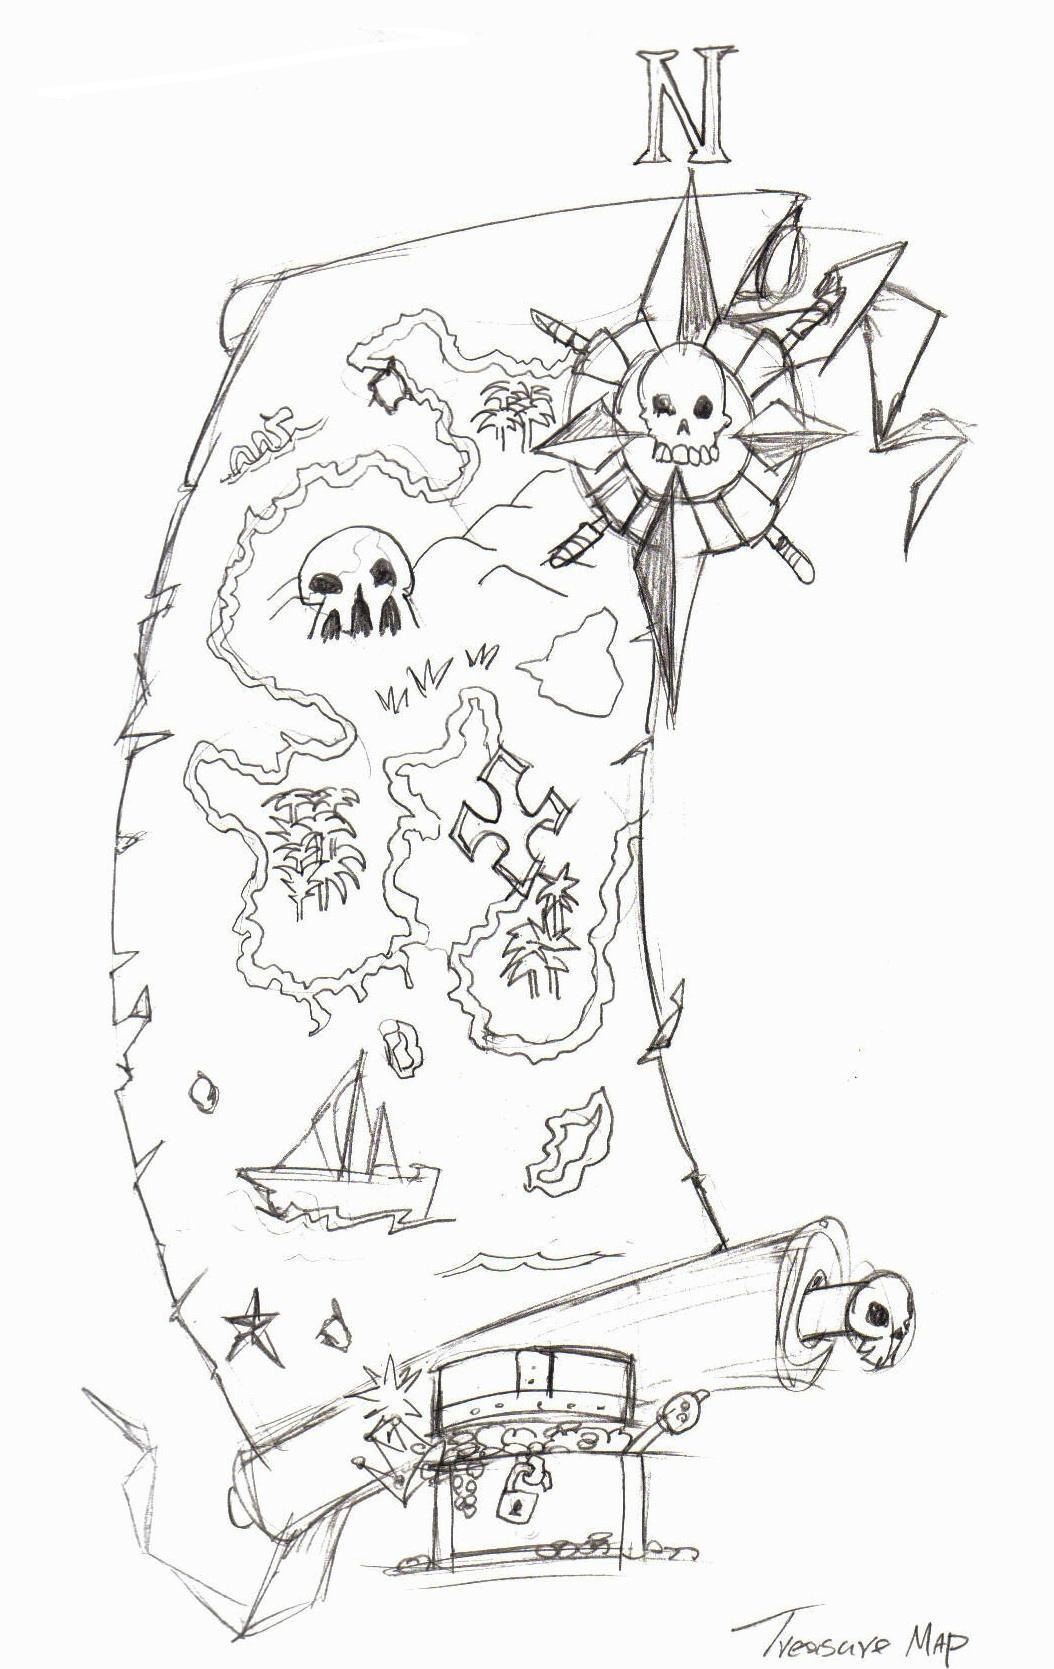 Treasure Map Tattoo By Evergreen Academy On DeviantArt